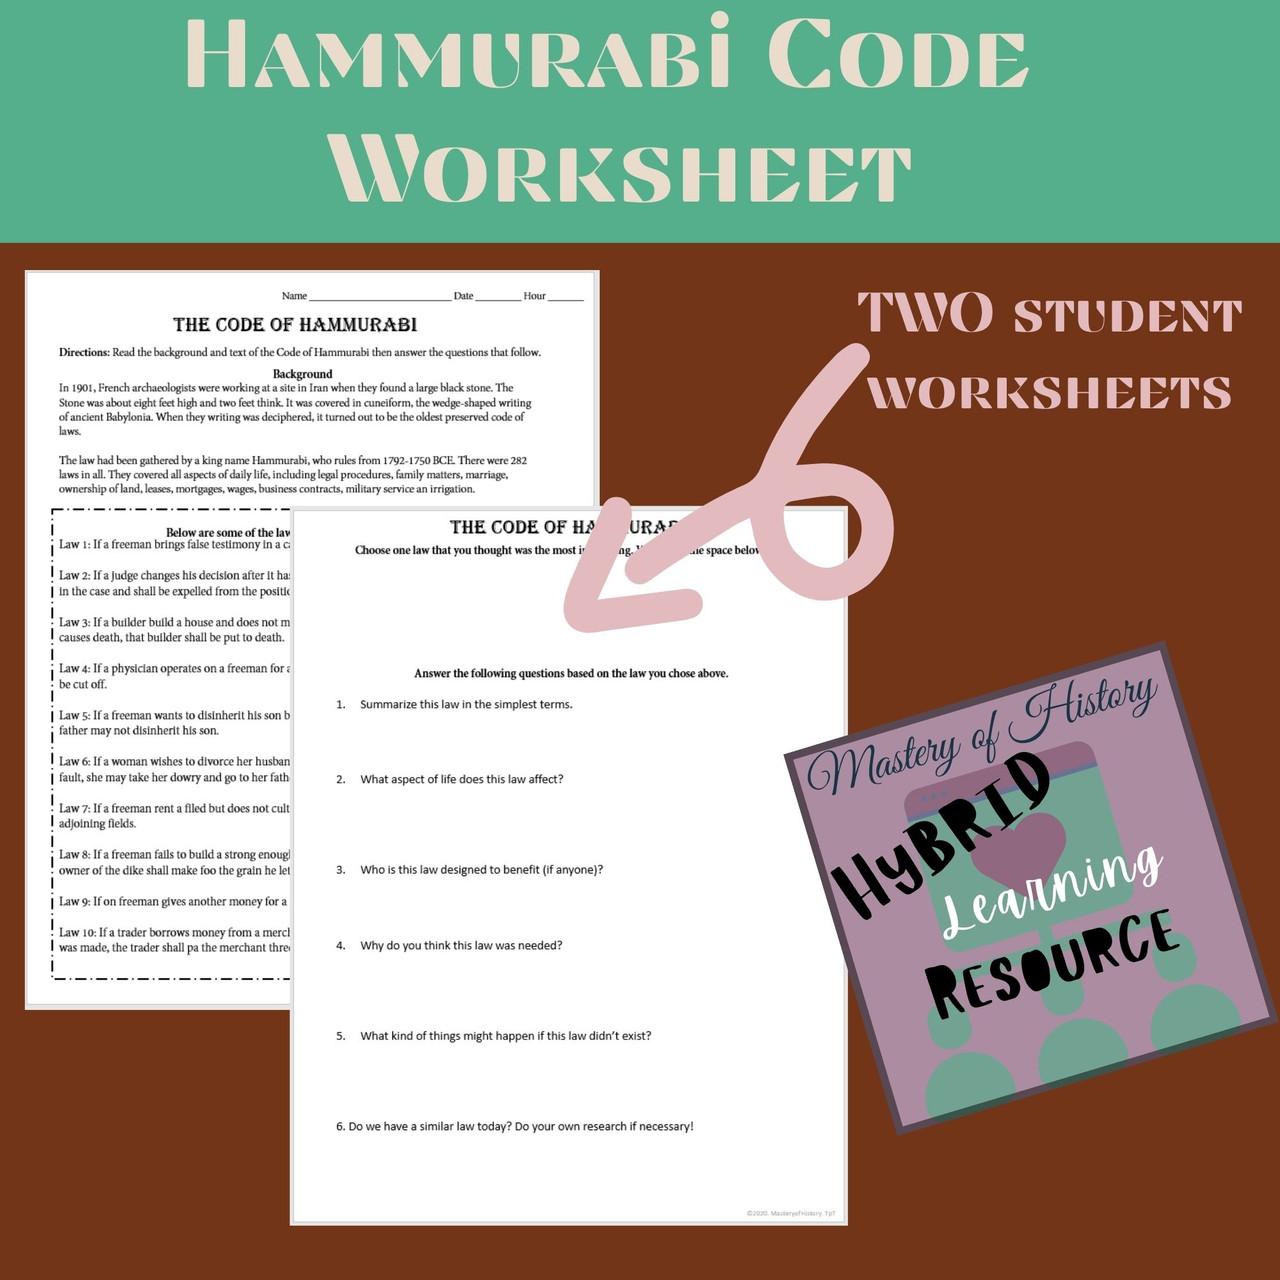 Code of Hammurabi Worksheet